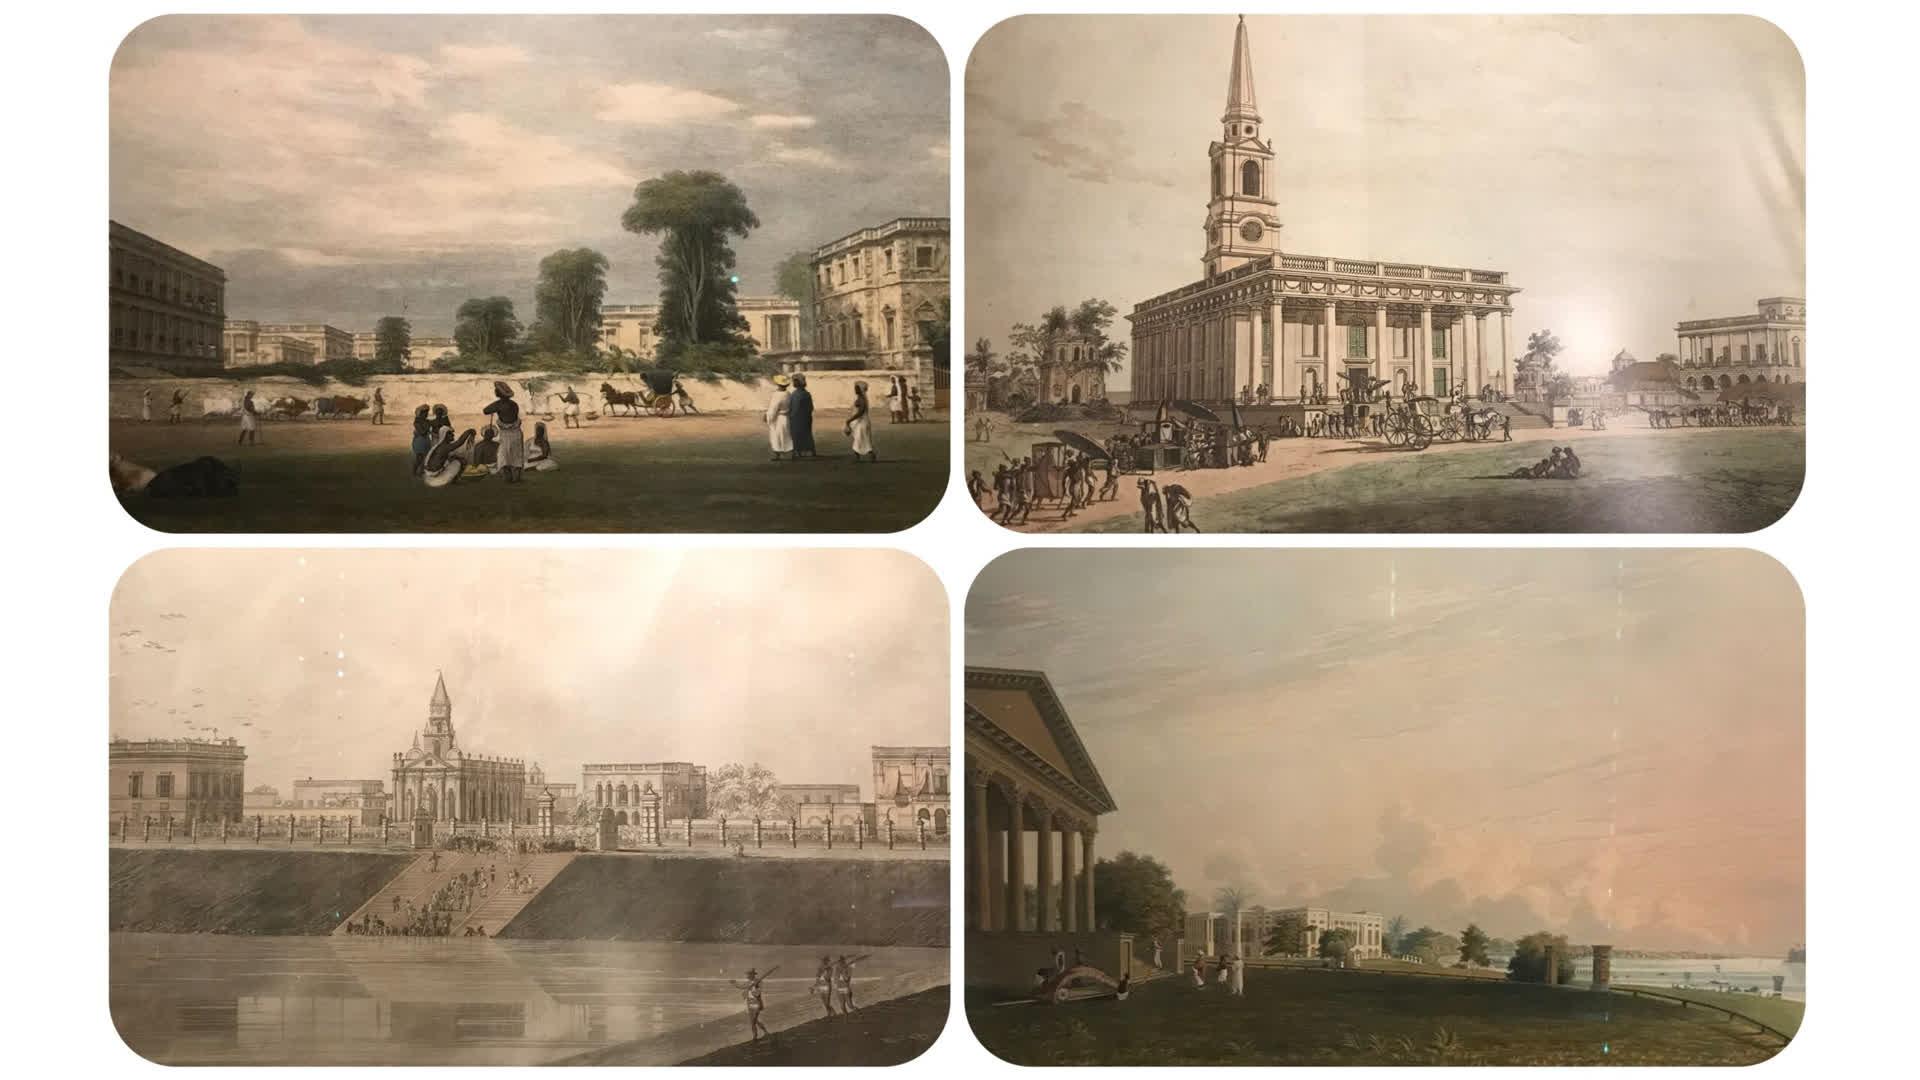 The Old Calcutta Captured